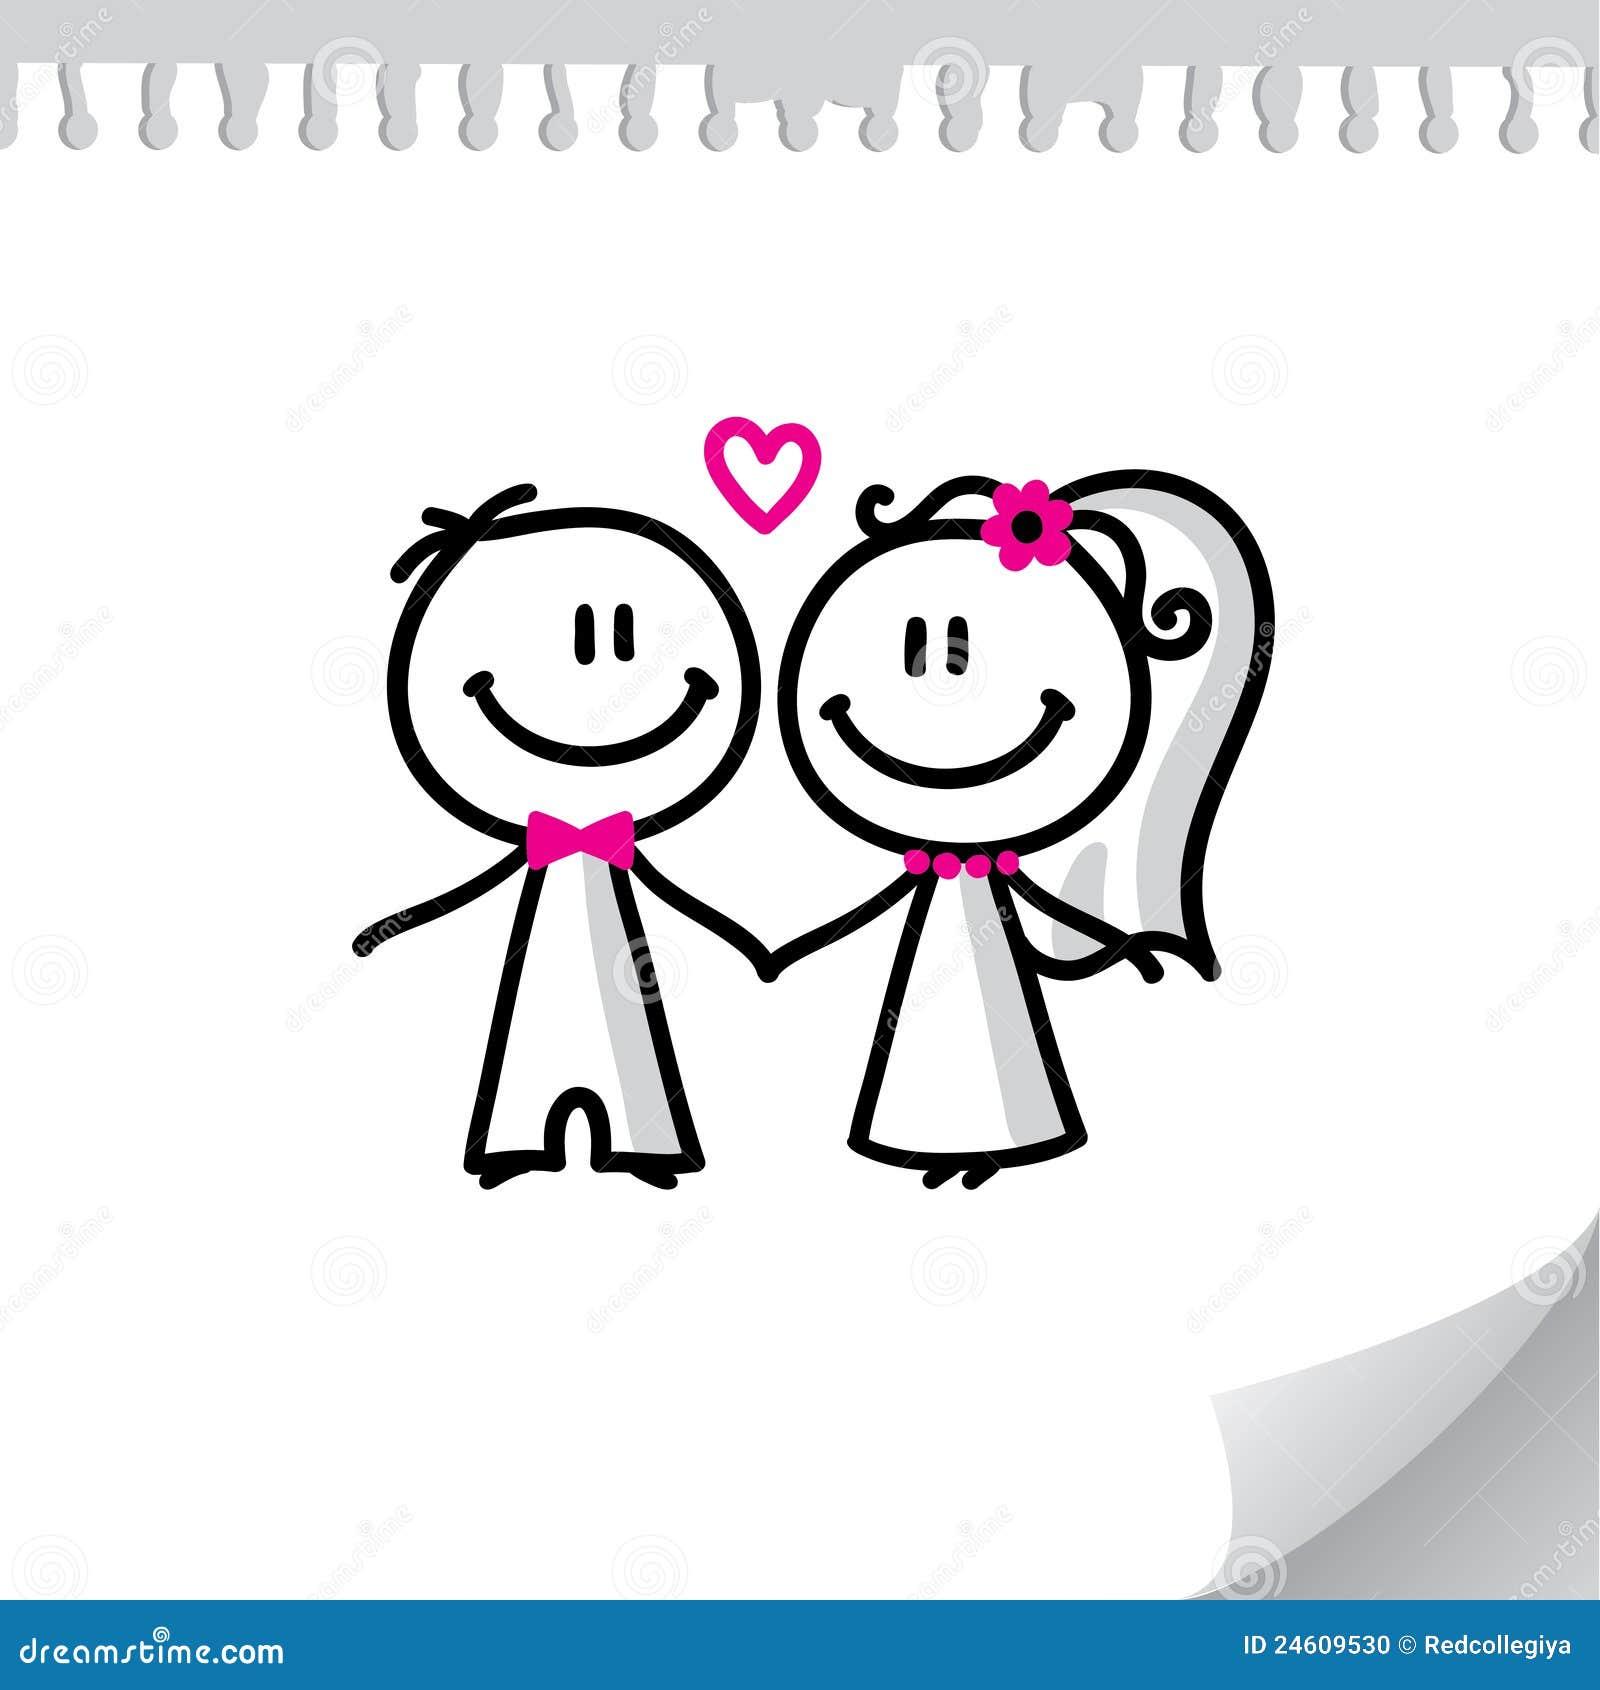 Cartoon wedding couple on realistic paper sheet.